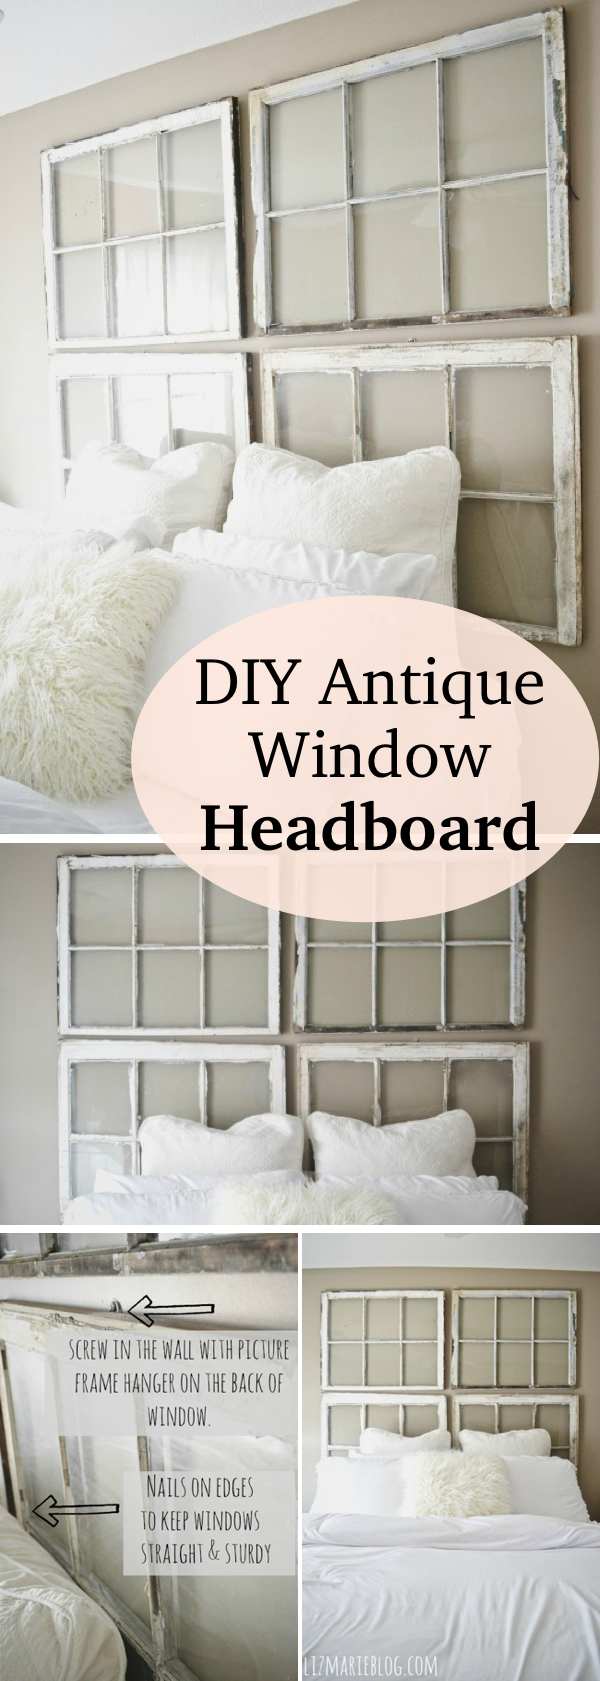 DIY Antique Window Headboard & 17 Brilliant Ways to Repurpose Old Windows - Homelovr Pezcame.Com